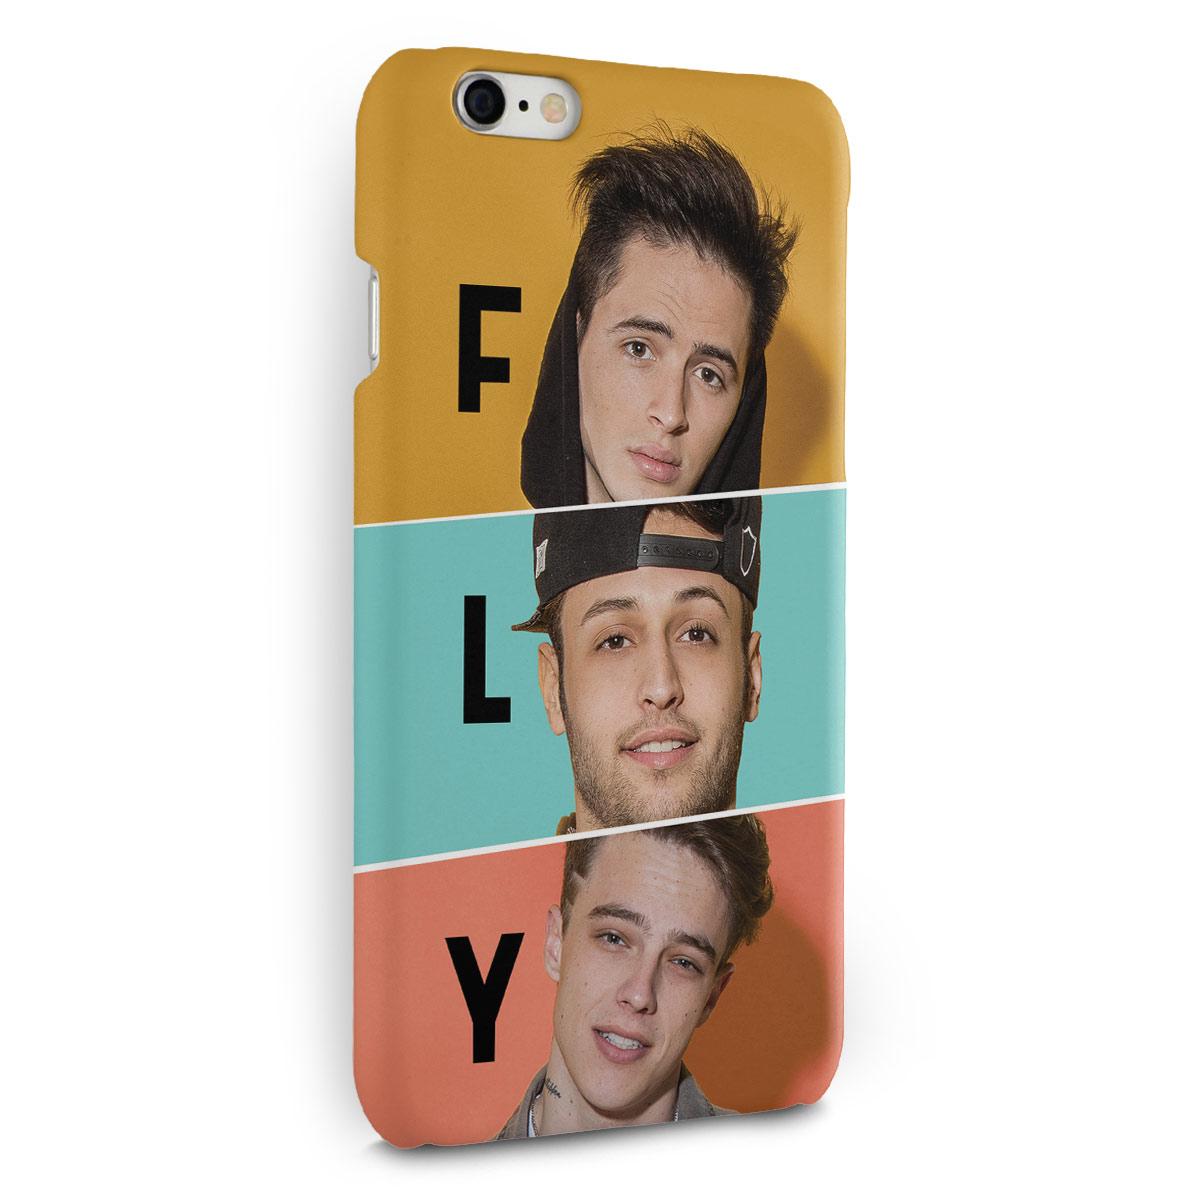 Capa para iPhone 6/6S Plus Banda Fly Trio